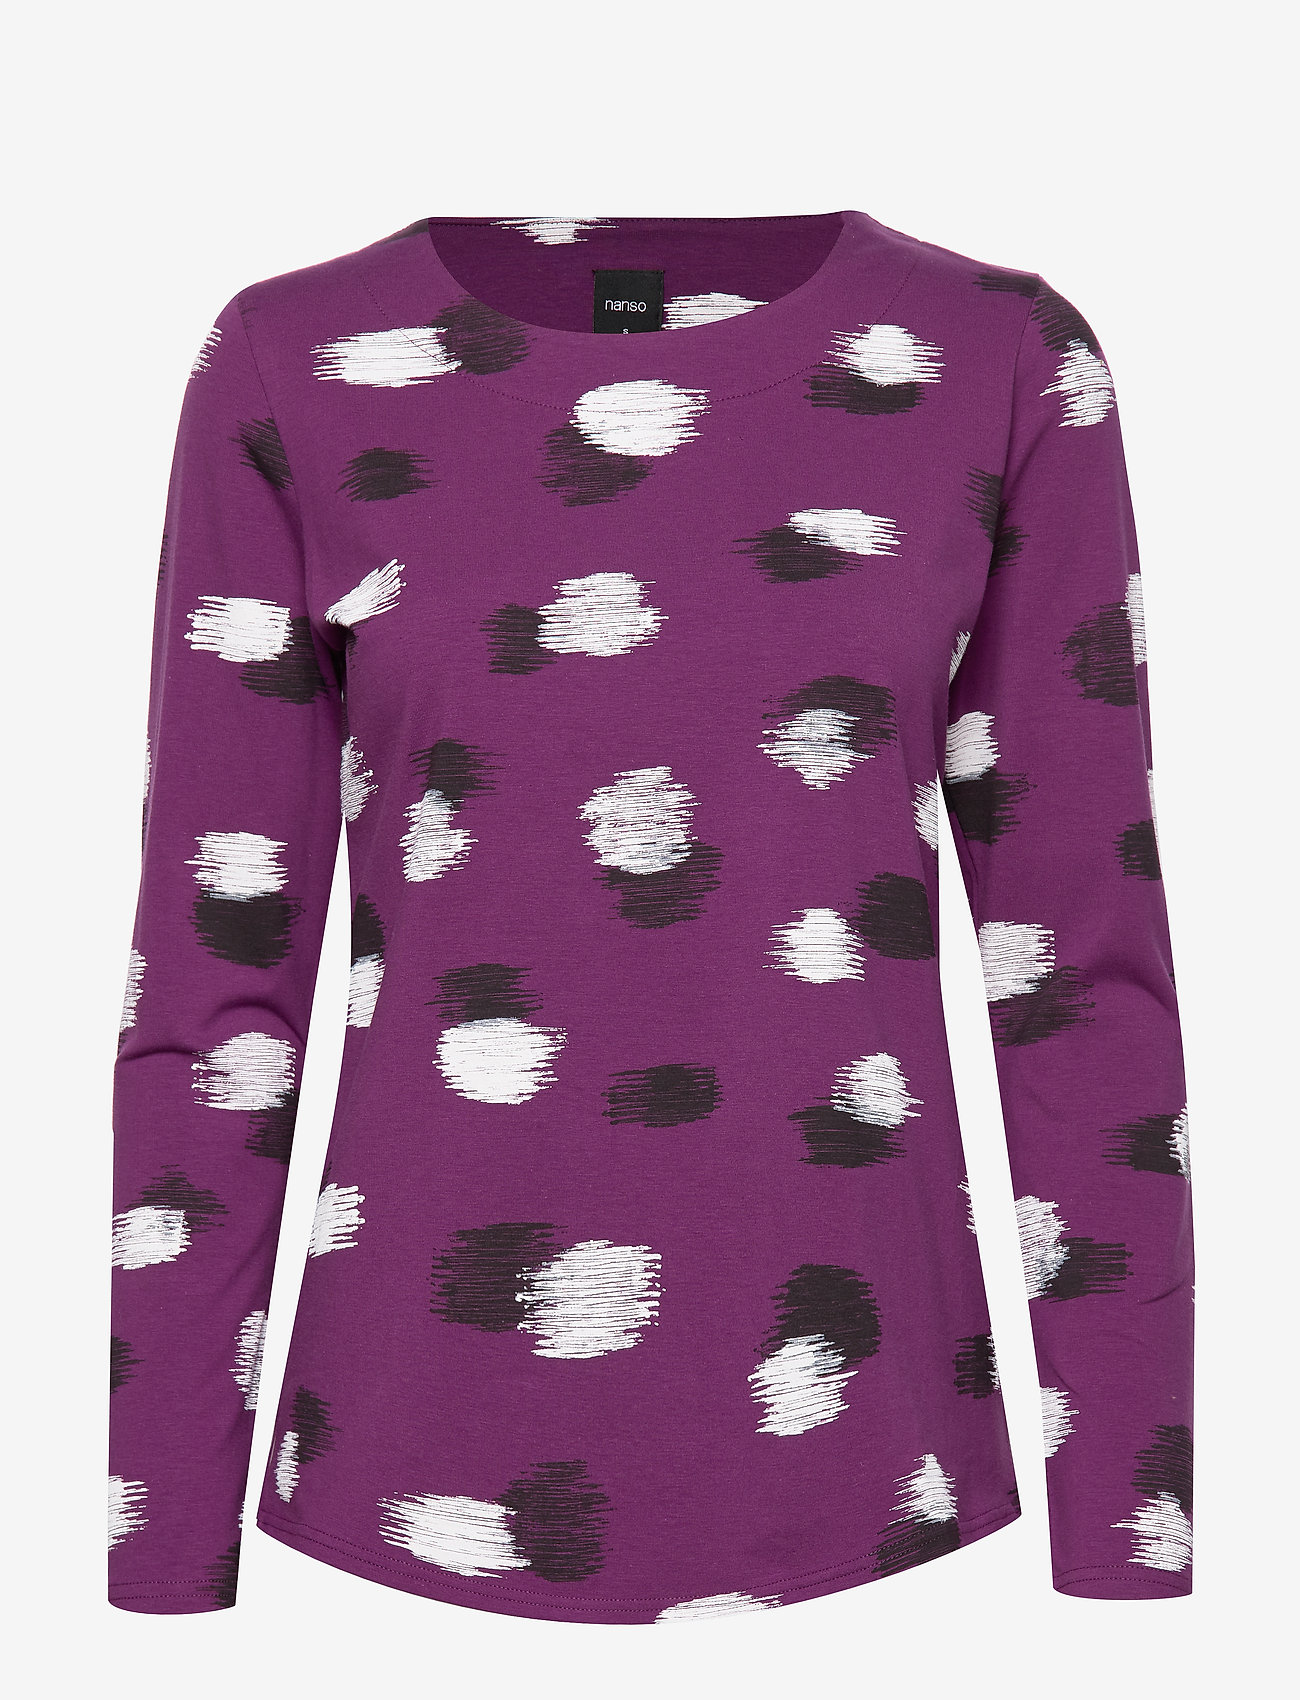 Nanso - Ladies blouse, Kastanja - pitkähihaiset t-paidat - purple - 0